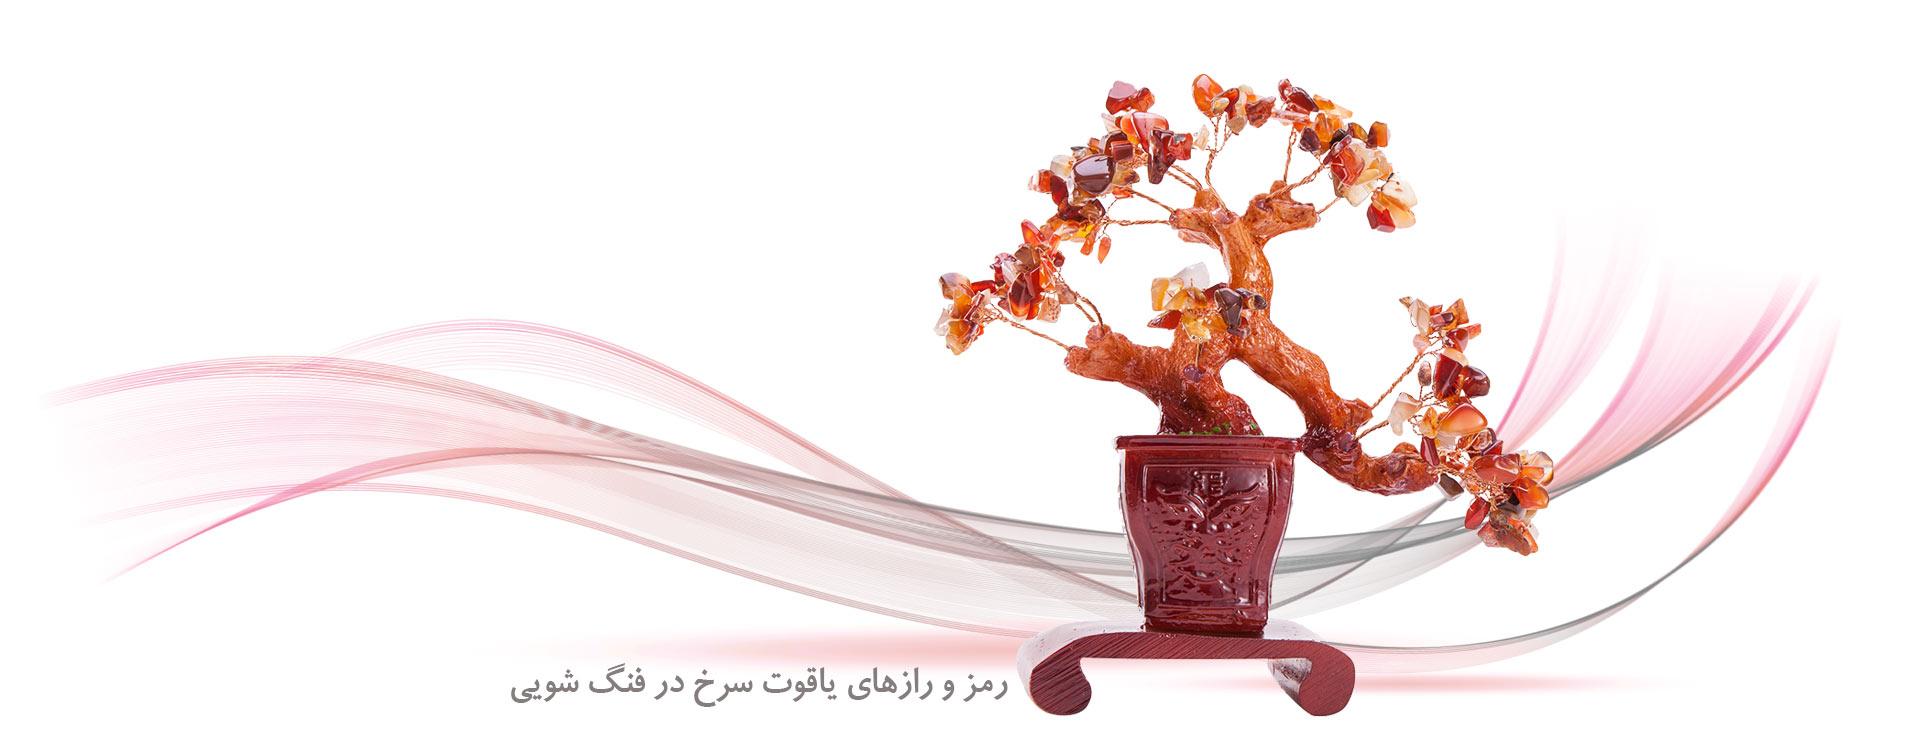 Ruby in Feng Shui 1 - رمز و رازهای یاقوت سرخ در فنگ شویی